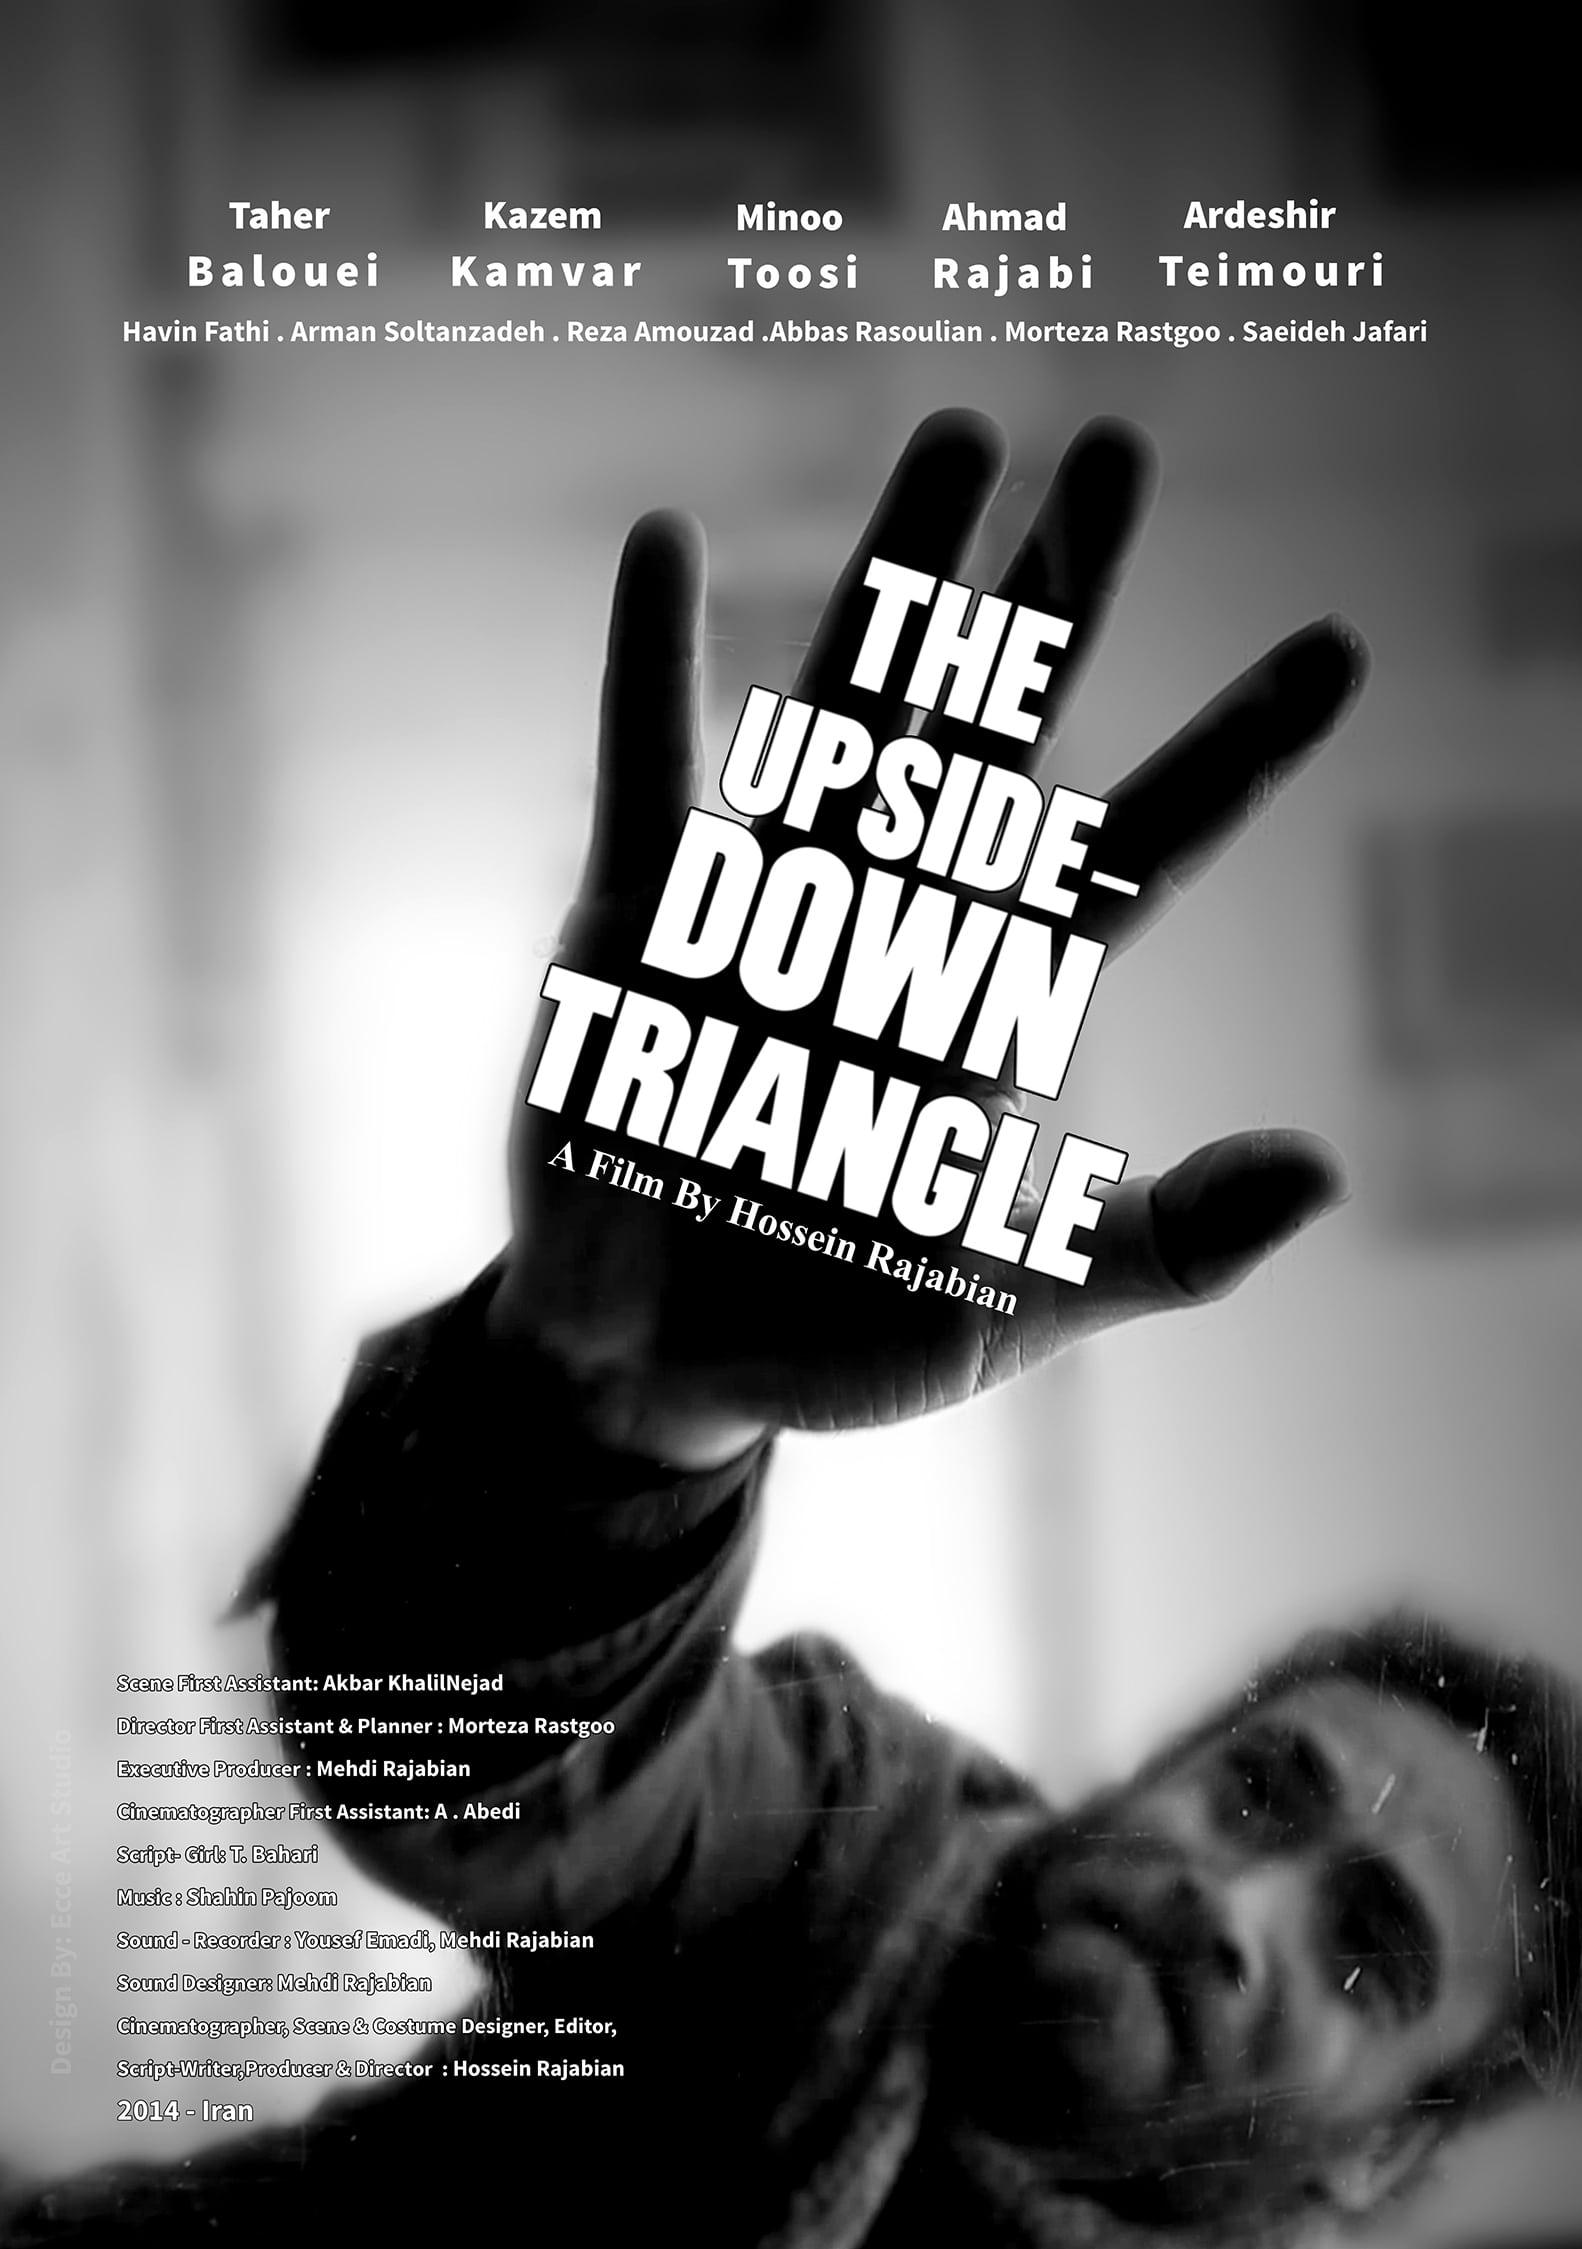 The Upside down Triangle A Film By Hossein Rajabian (2016)